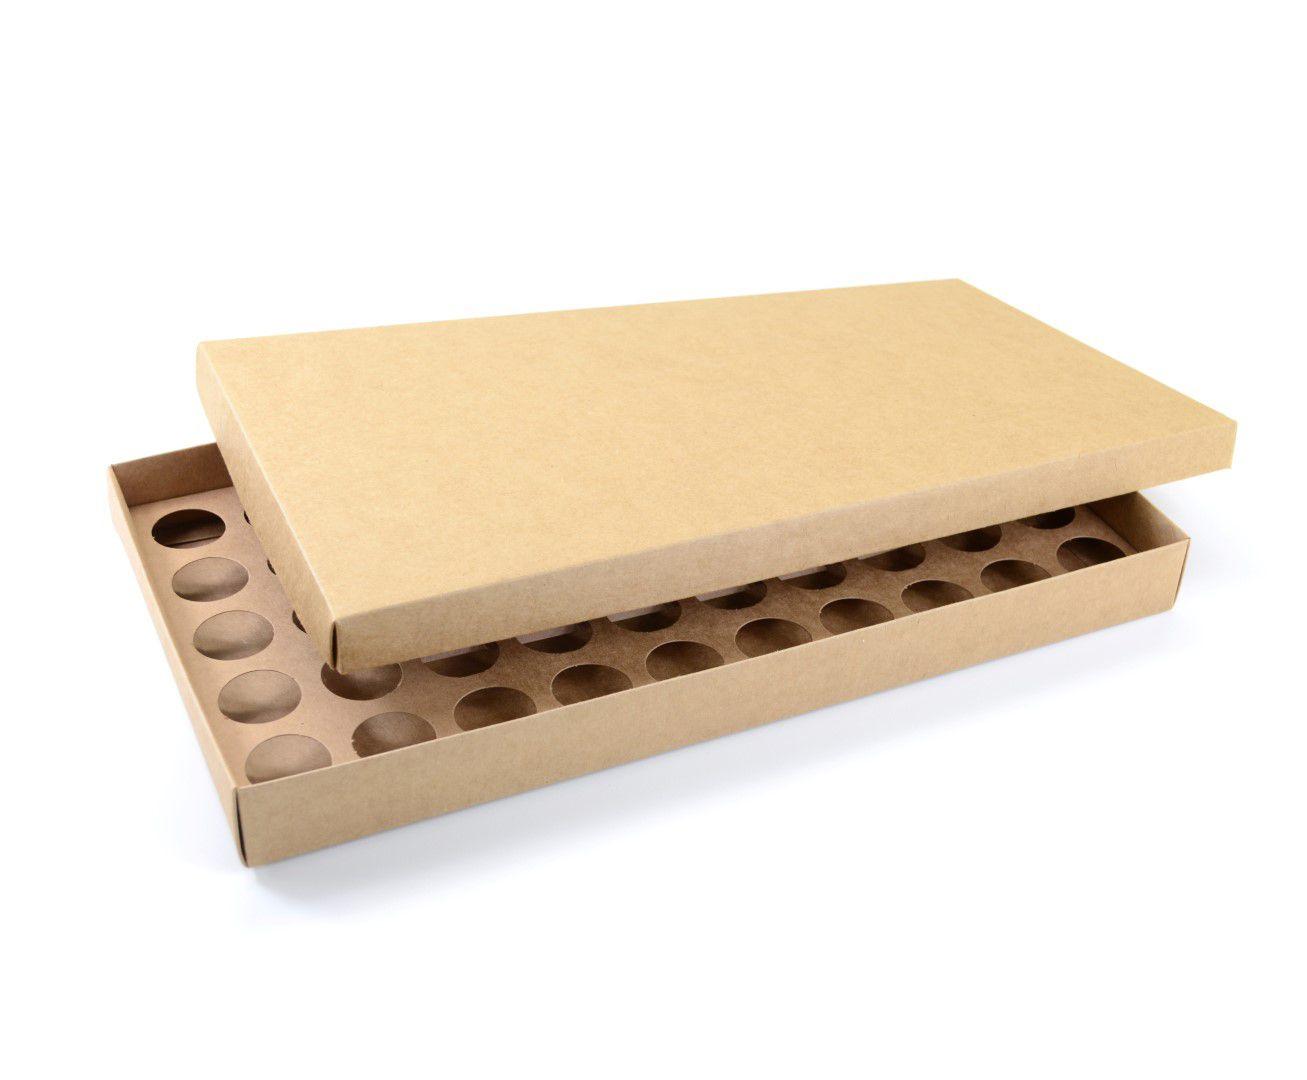 Ref 132 Kraft - Caixa p/ 50 Brigadeiro Gourmet Nº4 - c/ tampa papel - 43x23x4 cm - c/ 10 unidades